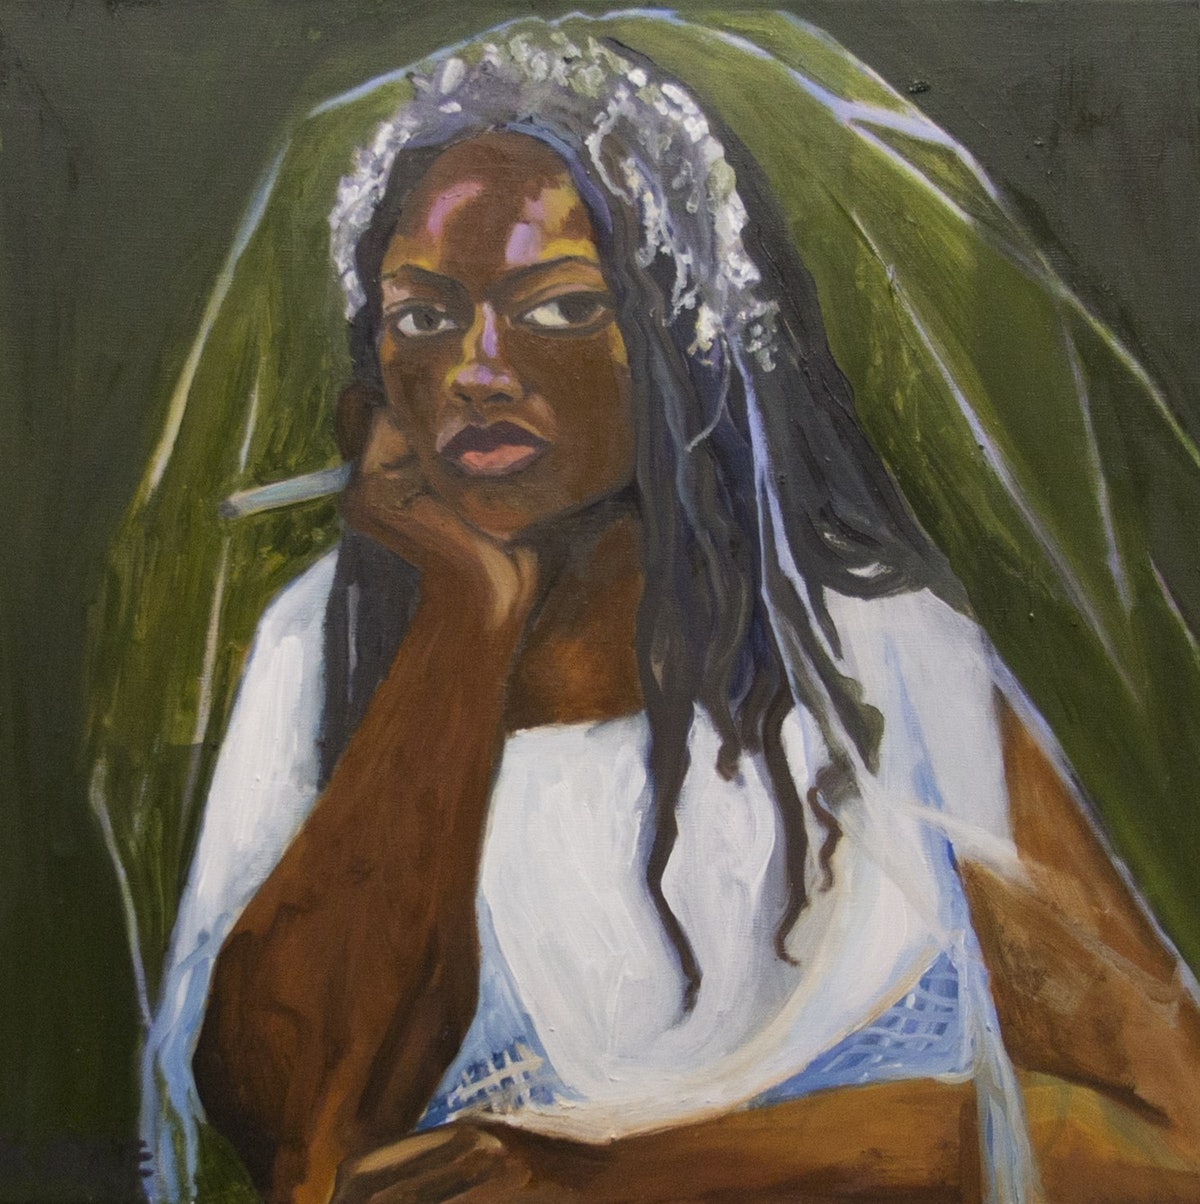 Kirke, Jemima, ShiShi in My Wedding Dress, 2017, Oil on canvas, 21 x 21 inches.jpg